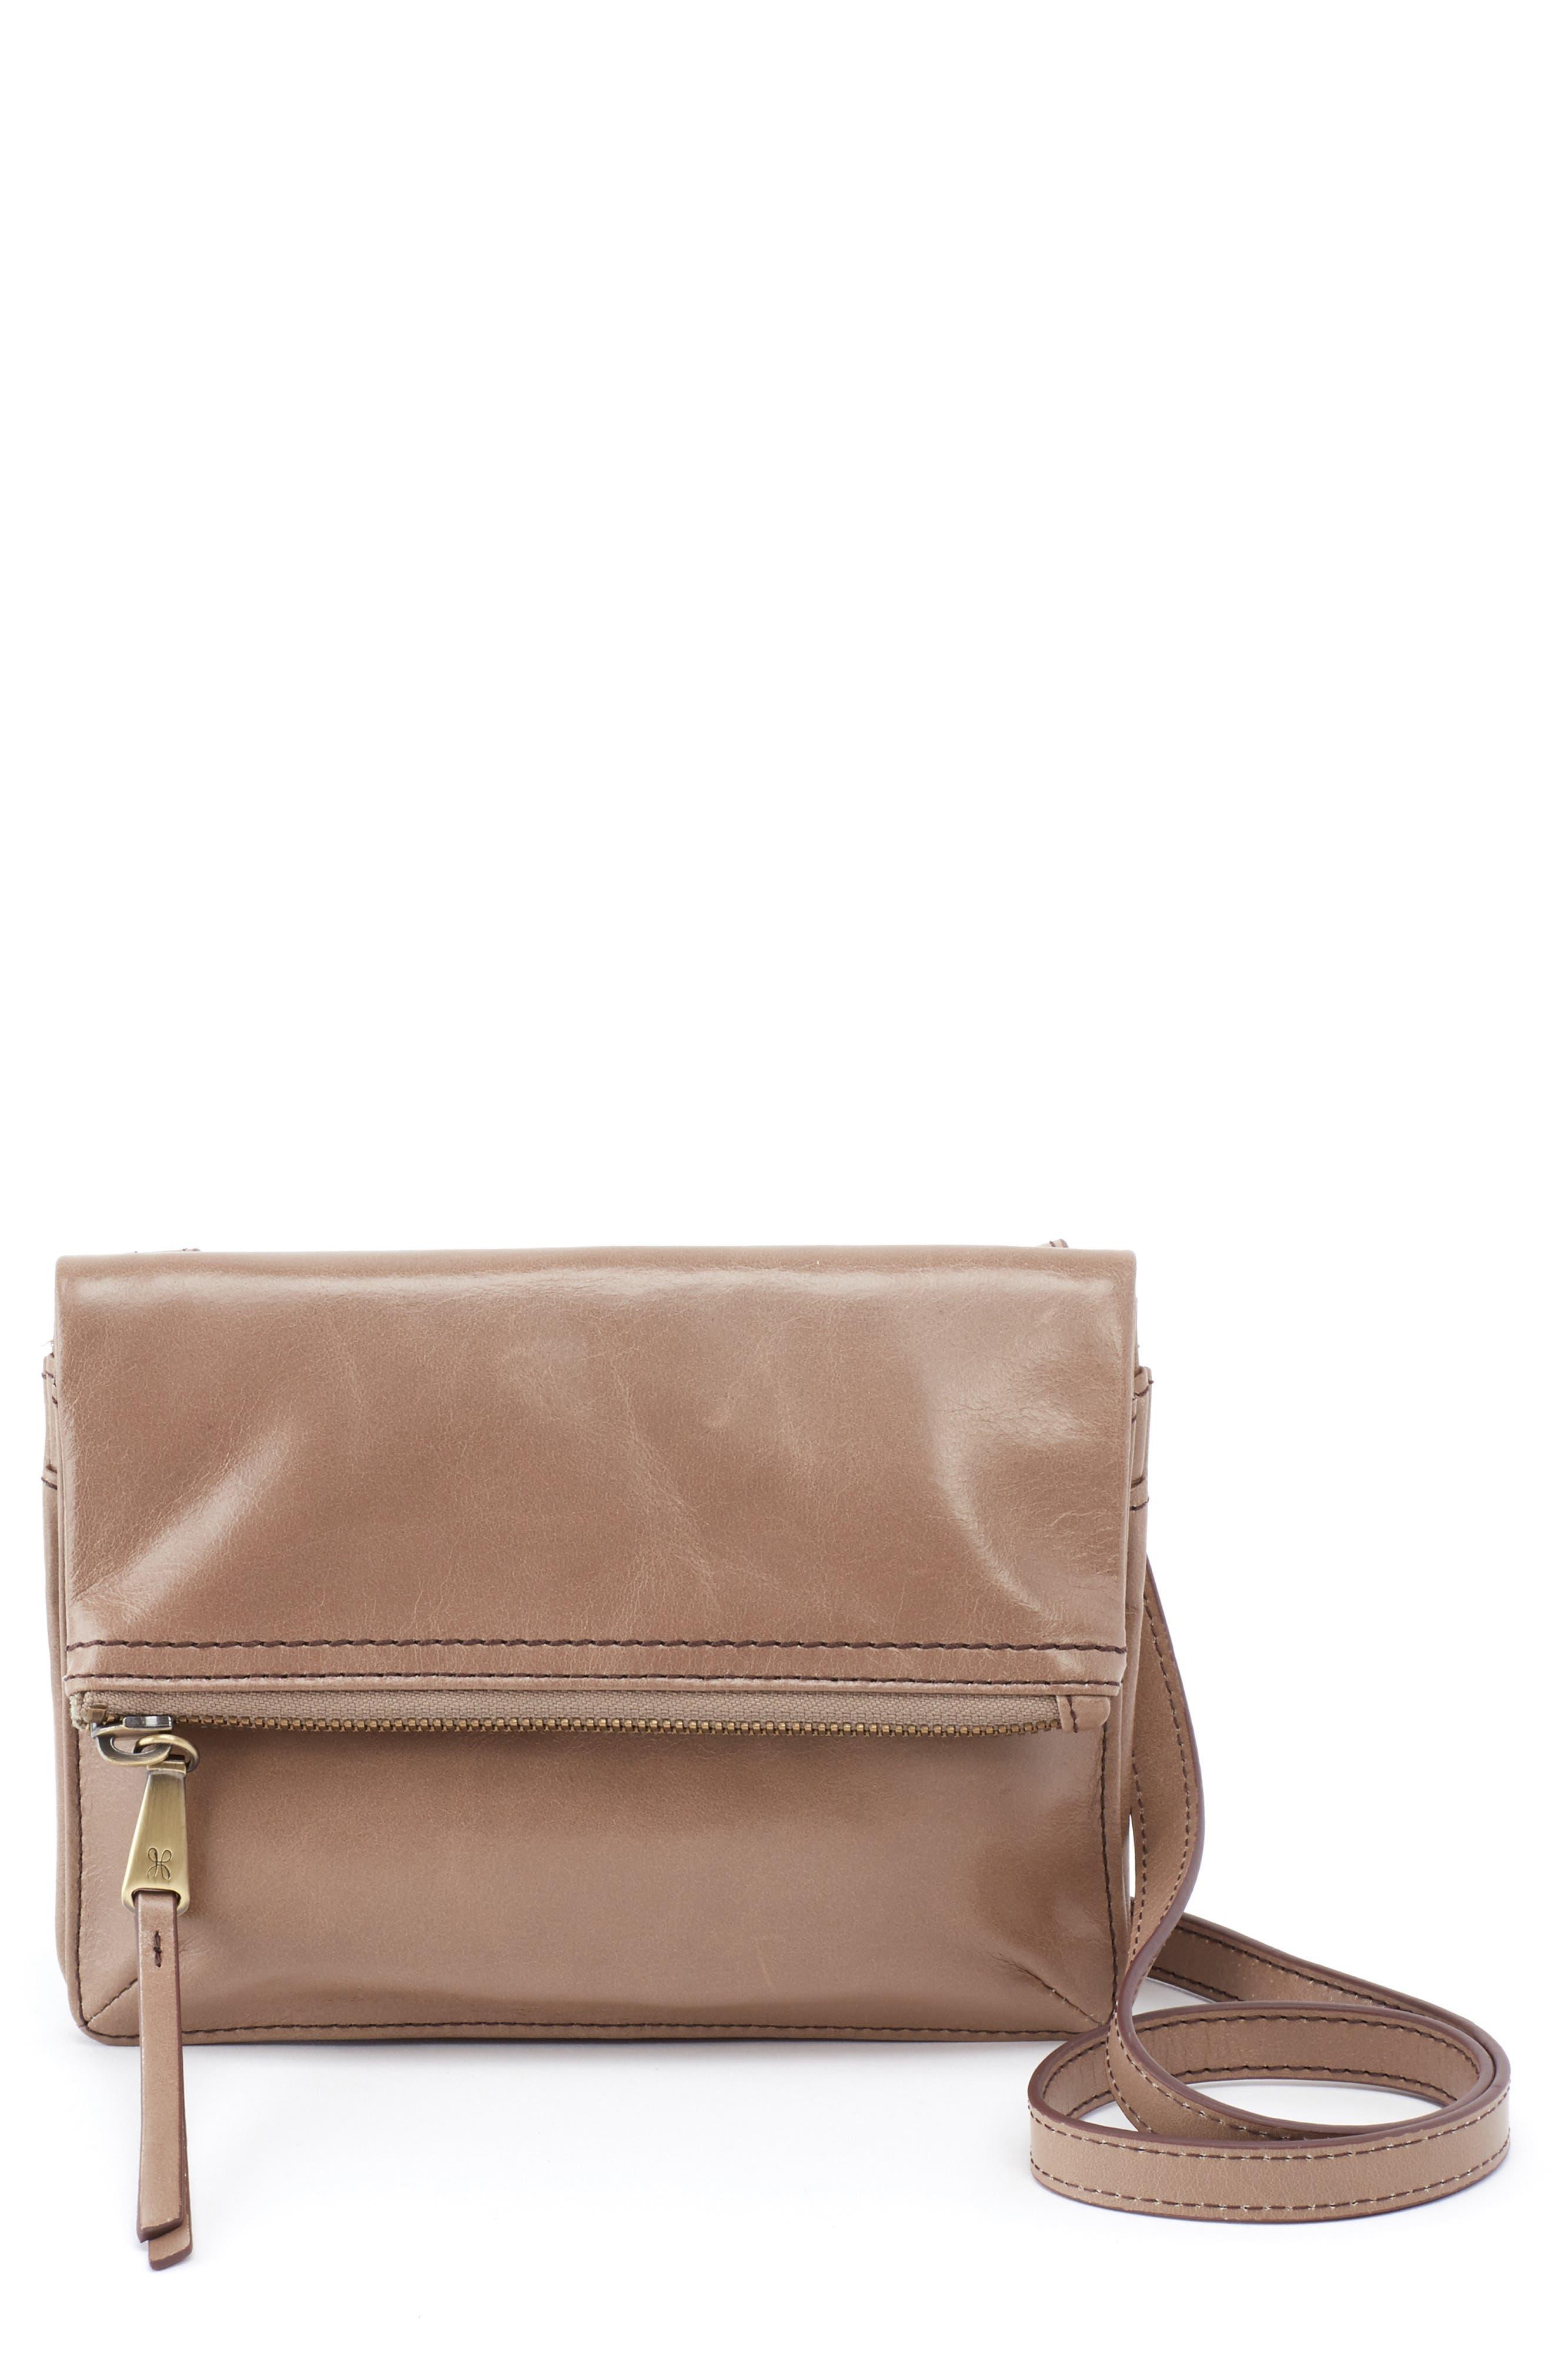 Glade Leather Crossbody Bag,                             Main thumbnail 1, color,                             COBBLESTONE